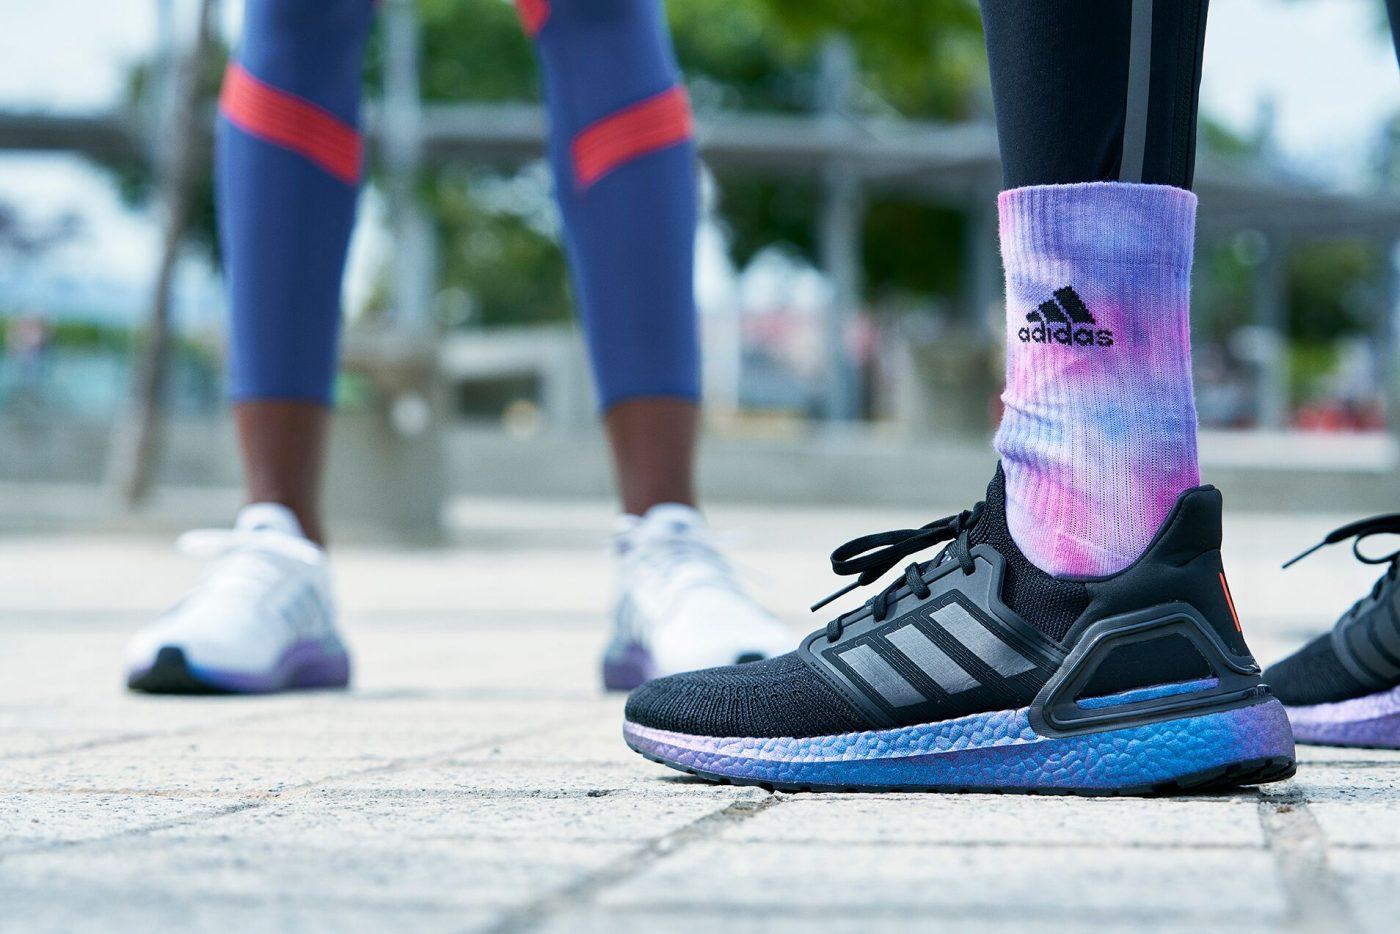 adidas-ultraboost-20-chaussures-running-runpack-4